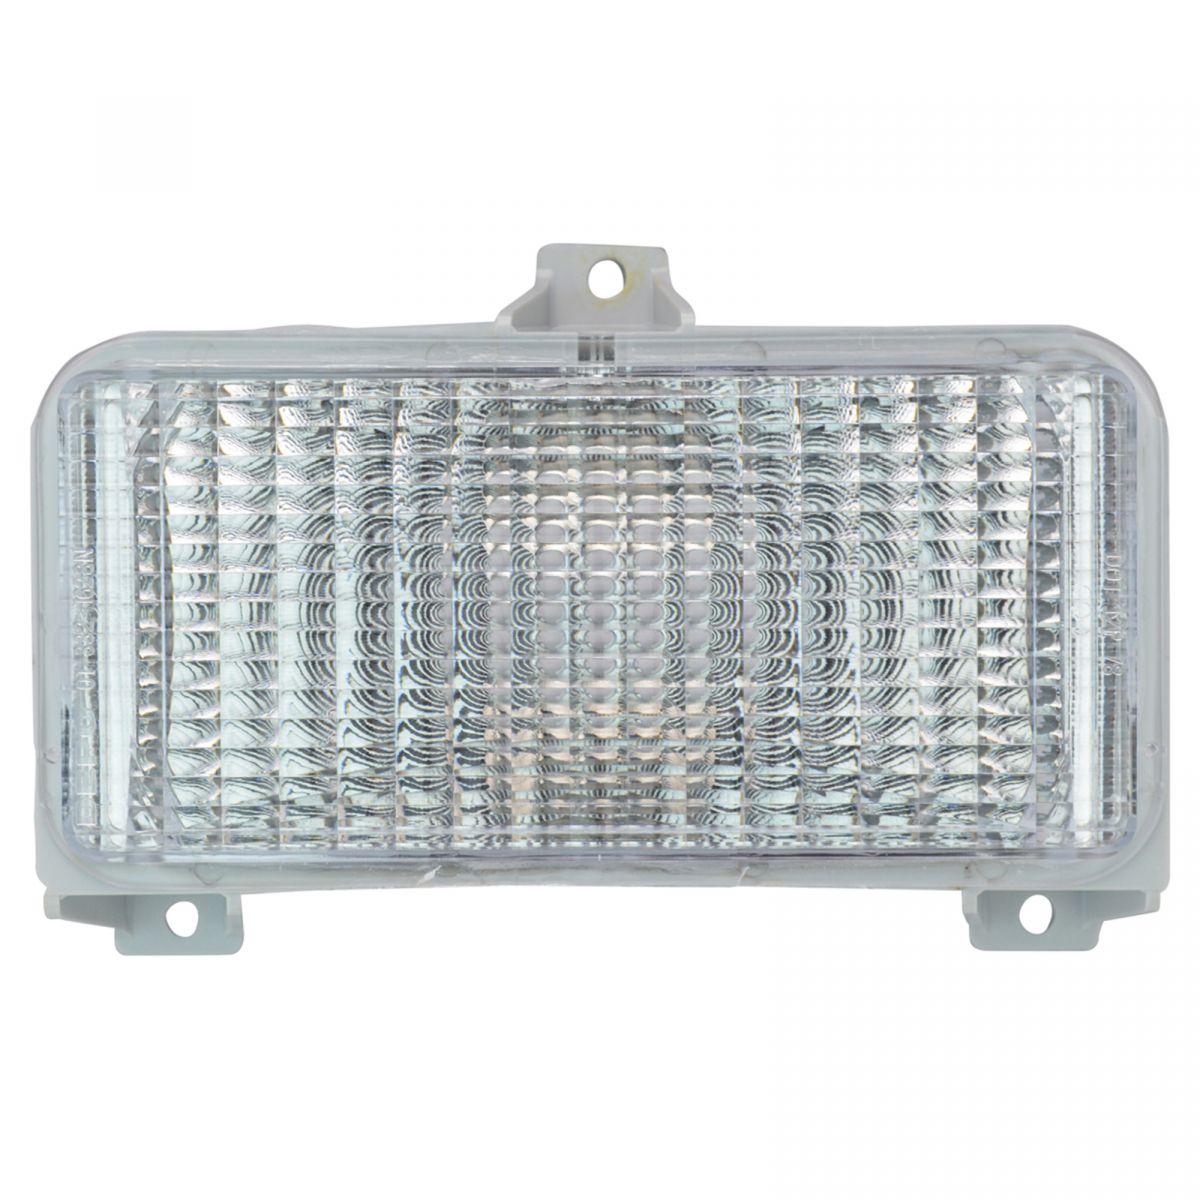 Turn Signal Light Lamp LH Or RH For 83-91 Chevy GMC Van W